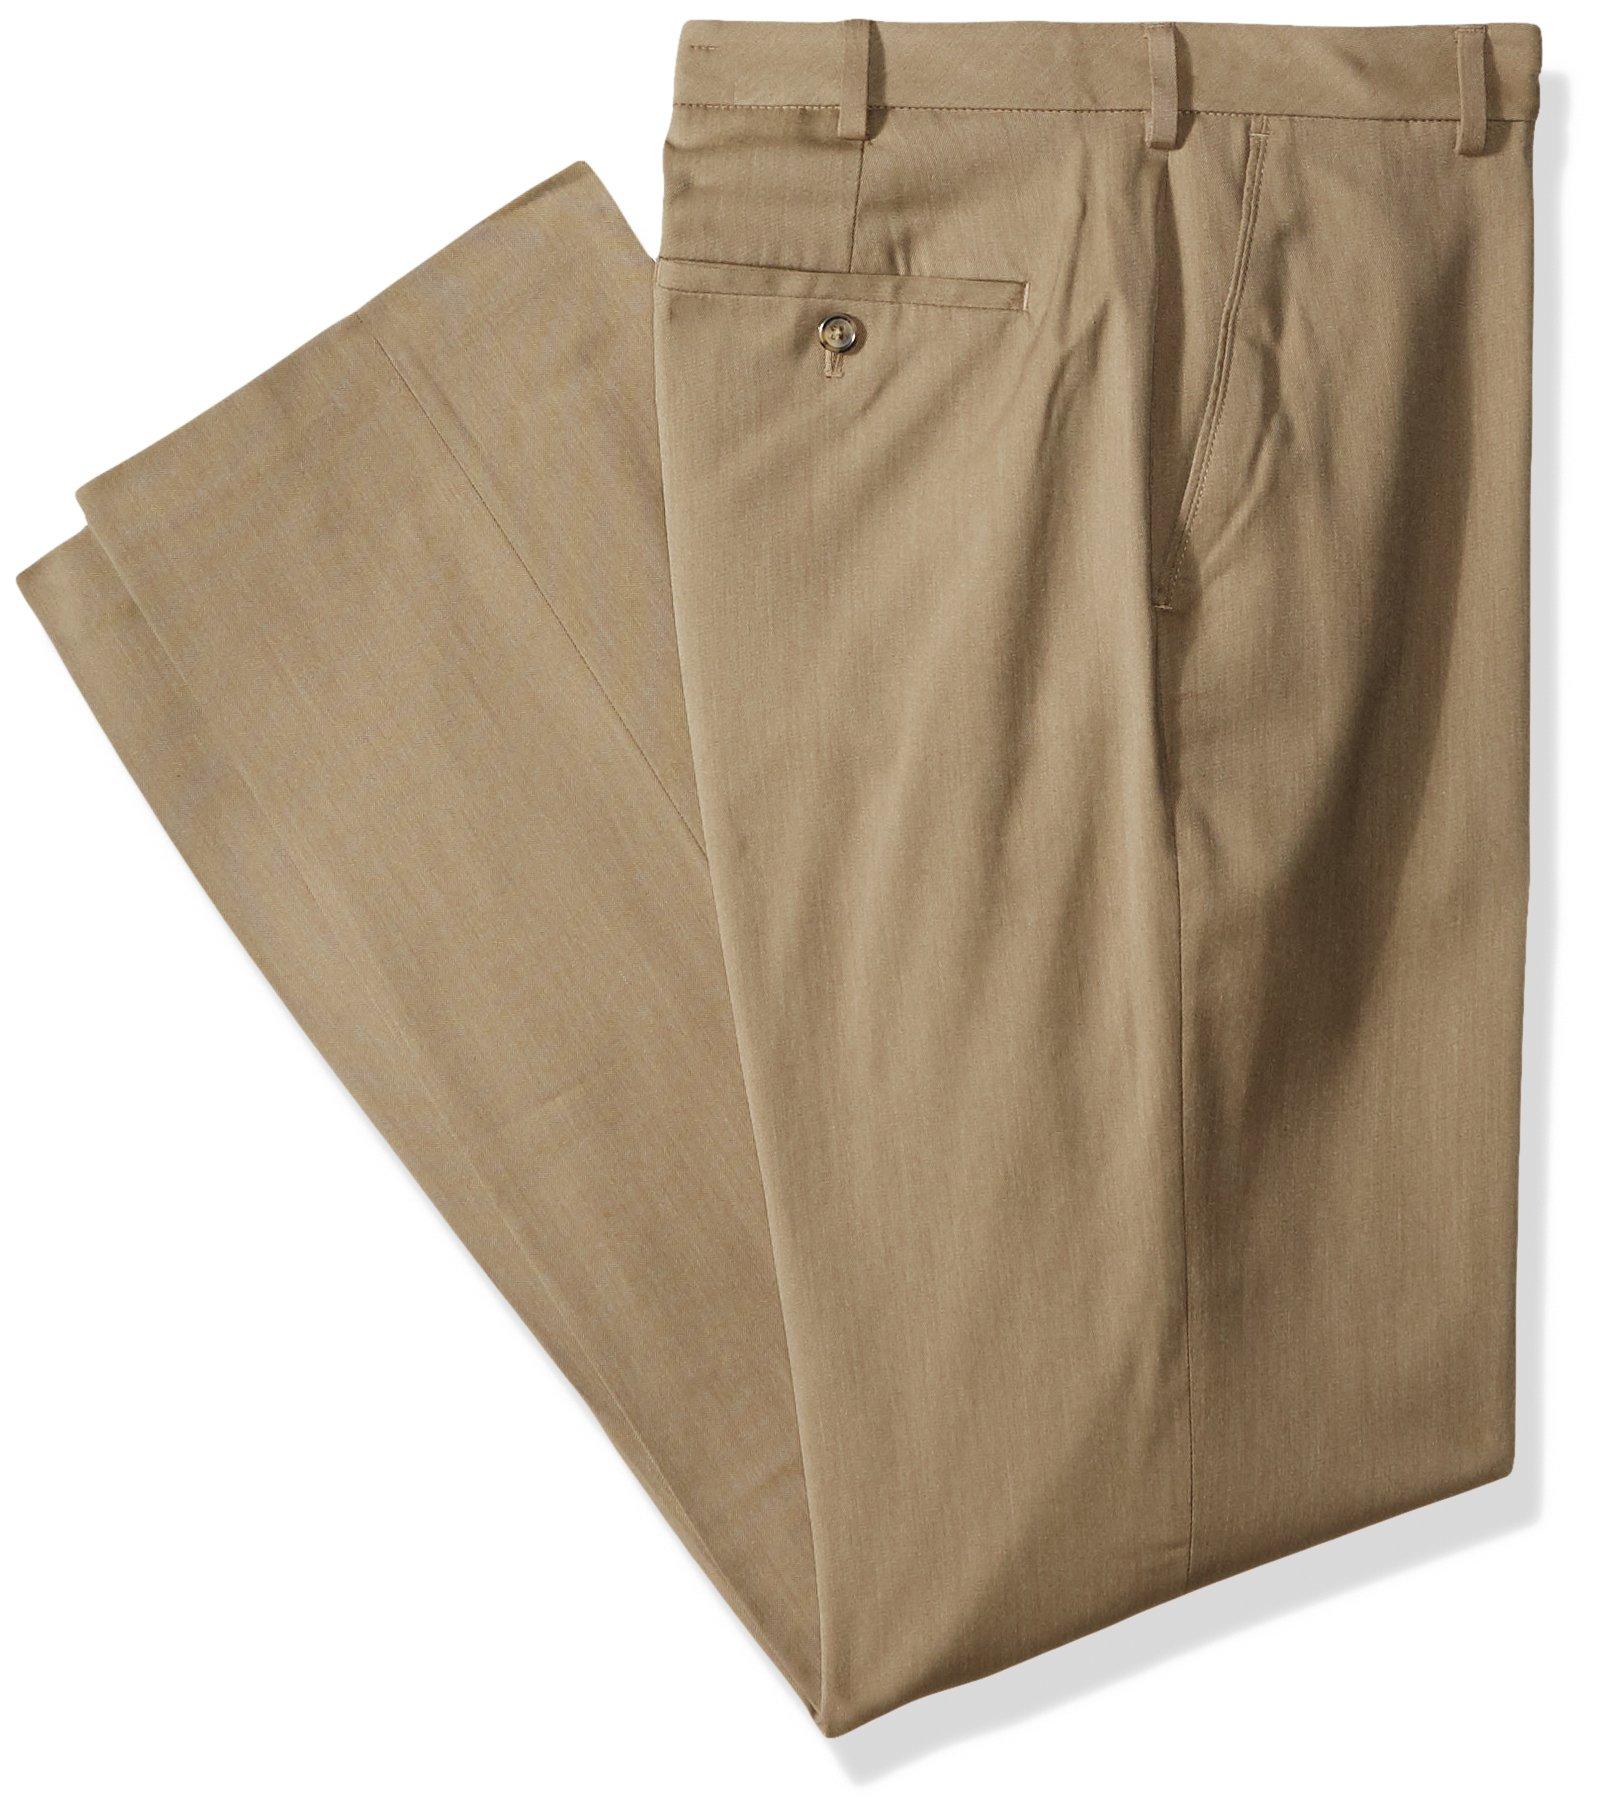 Van Heusen Men's Big and Tall Air Straight Fit Flat Front Dress Pant, Khaki, 36W X 36L